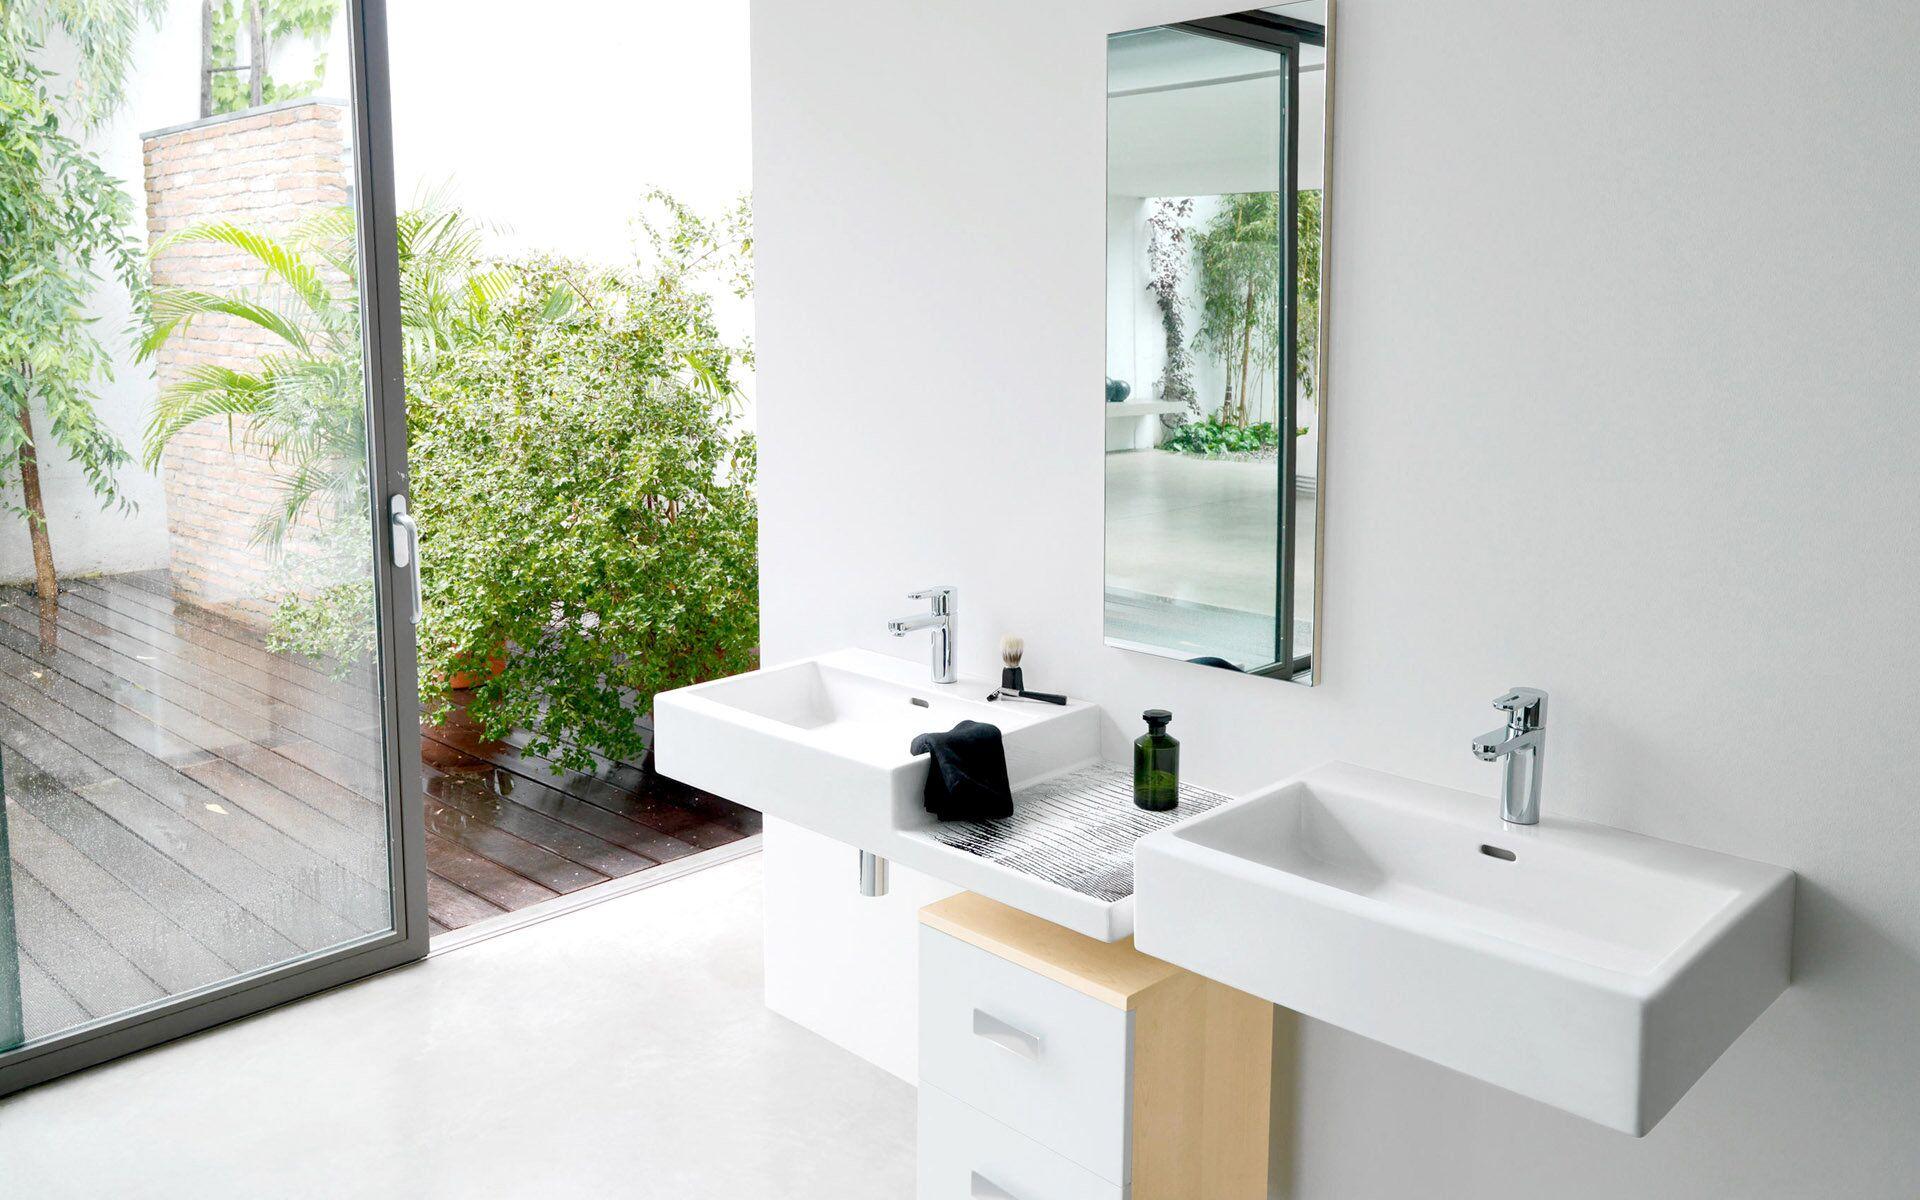 KEDIBO useful ceramic wall hung basin grab now for commercial apartment-15